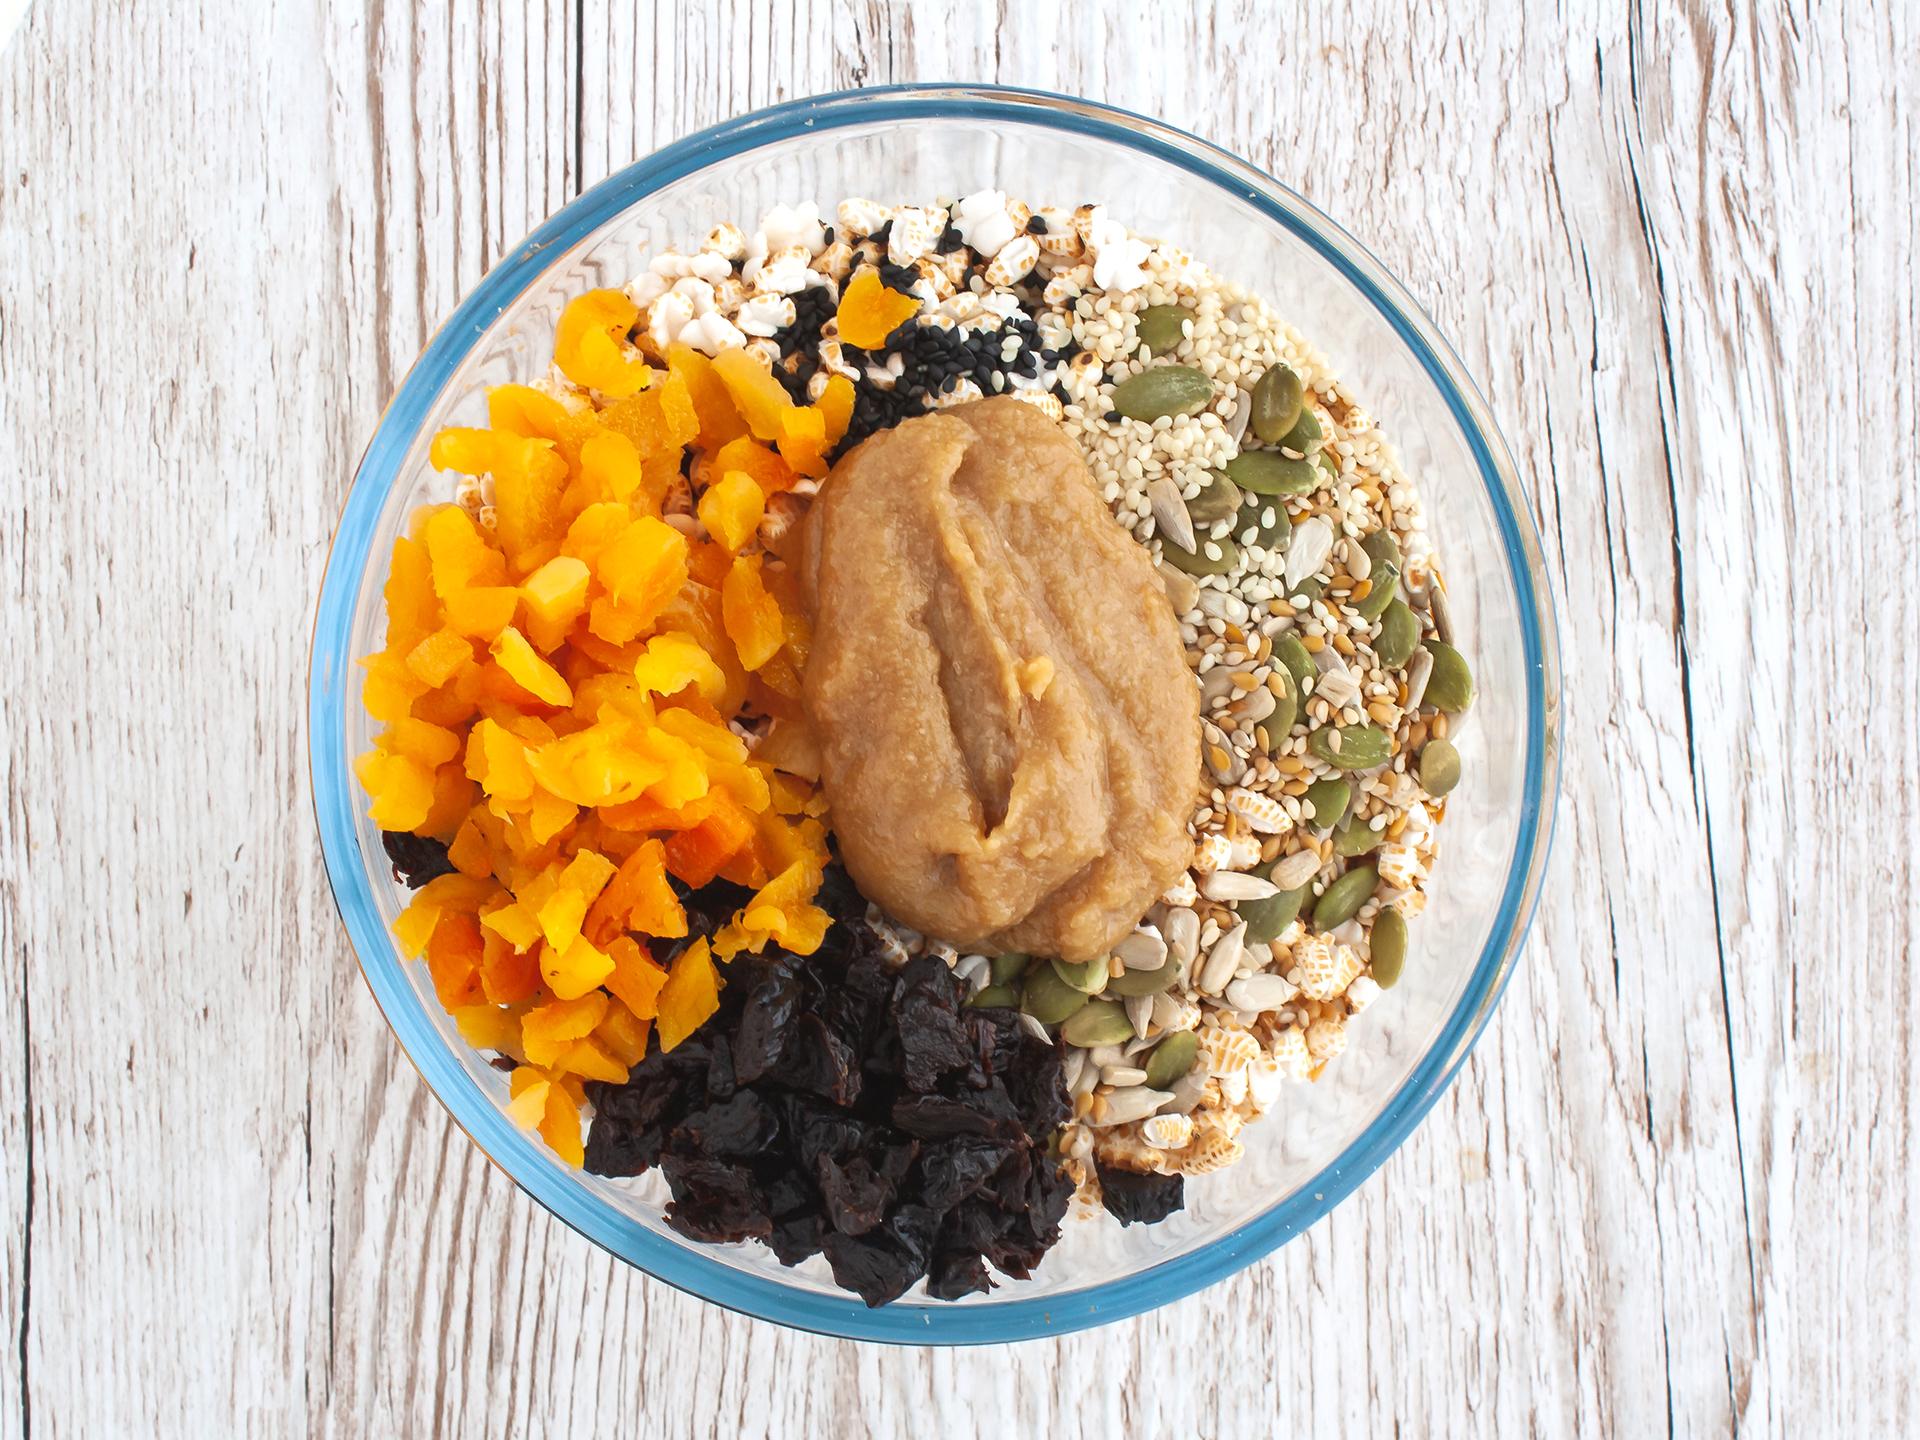 Step 2.1 of Sesame Puffed Rice Bars Recipe